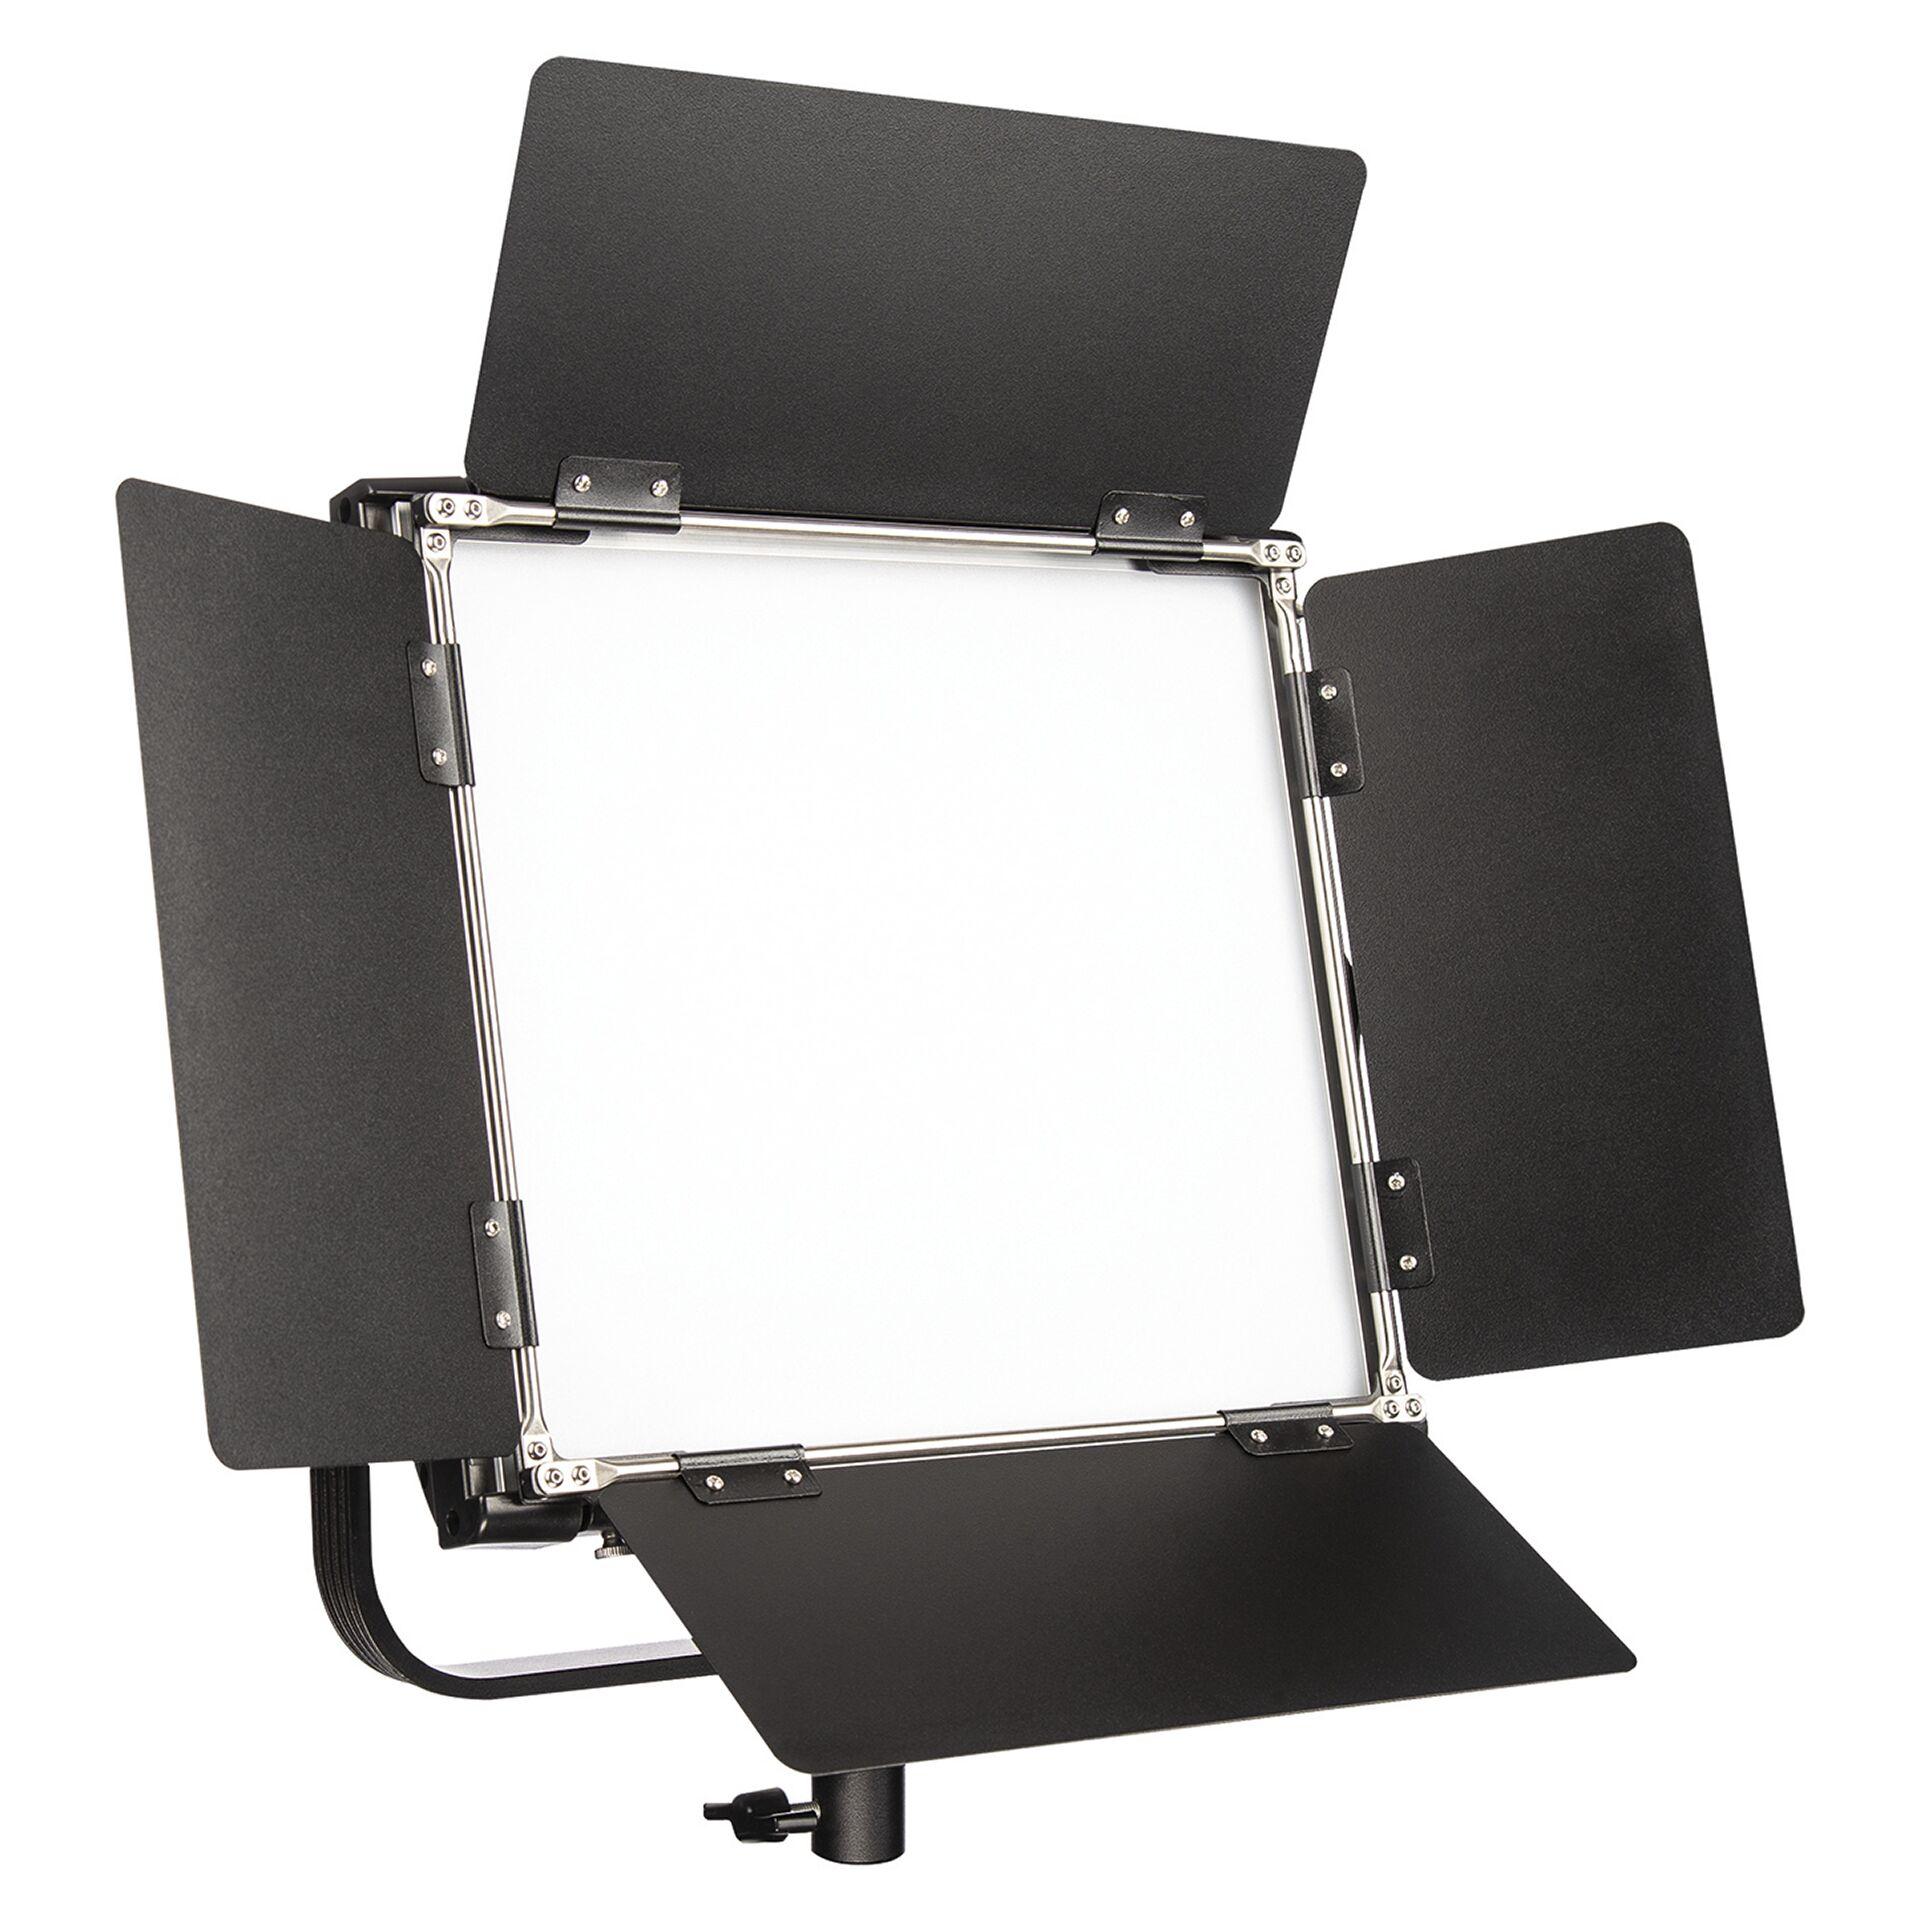 Walimex Pro Rainbow LED RGBWW Fluorescent Light 100W